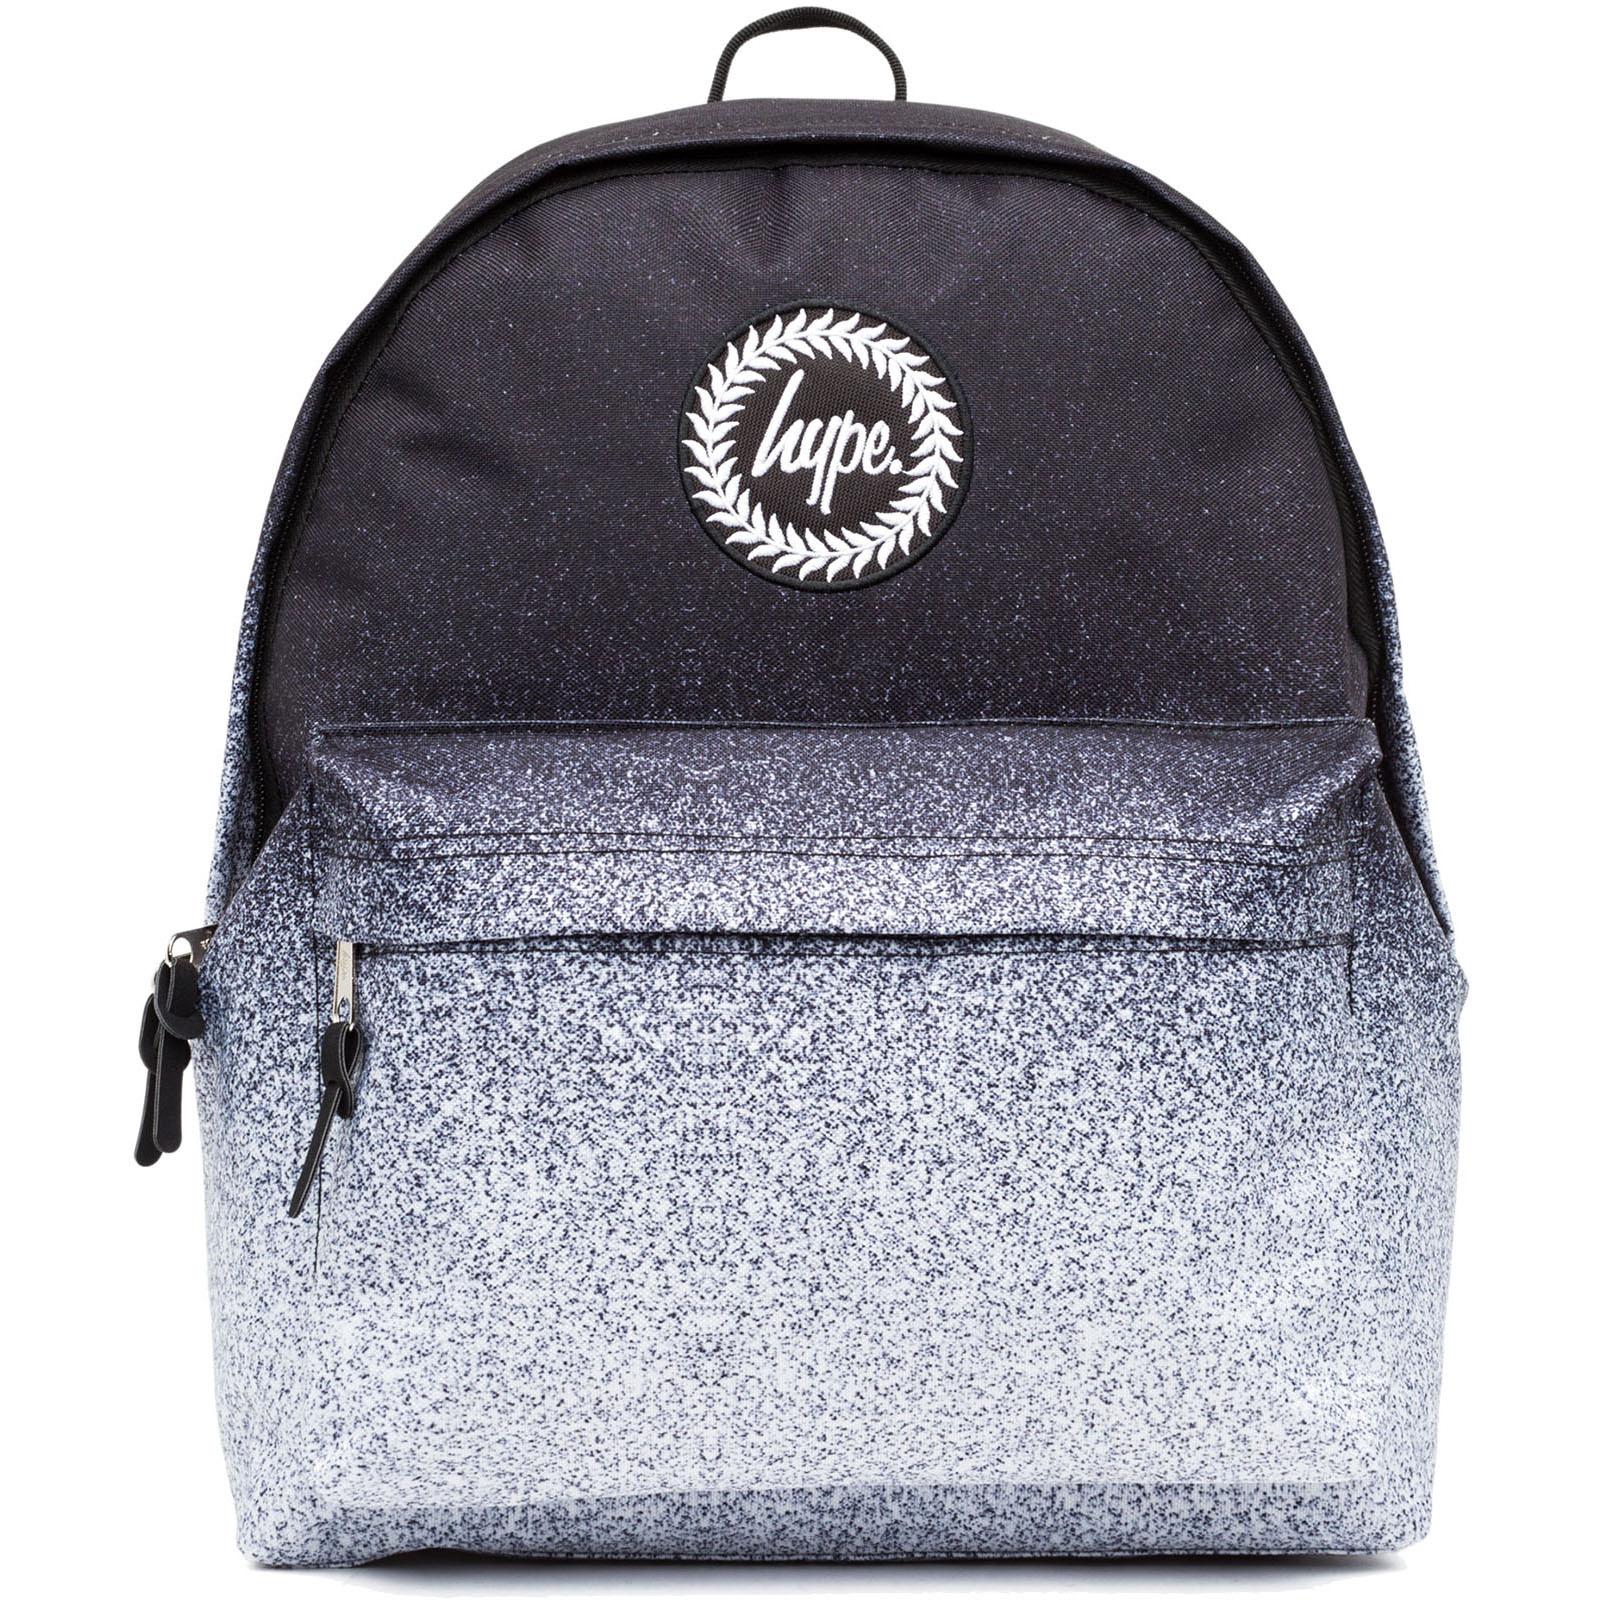 Sentinel Hype Speckle Fade Backpack   Rucksack Bag - Speckle Fade Black    White 019412b8bff0c